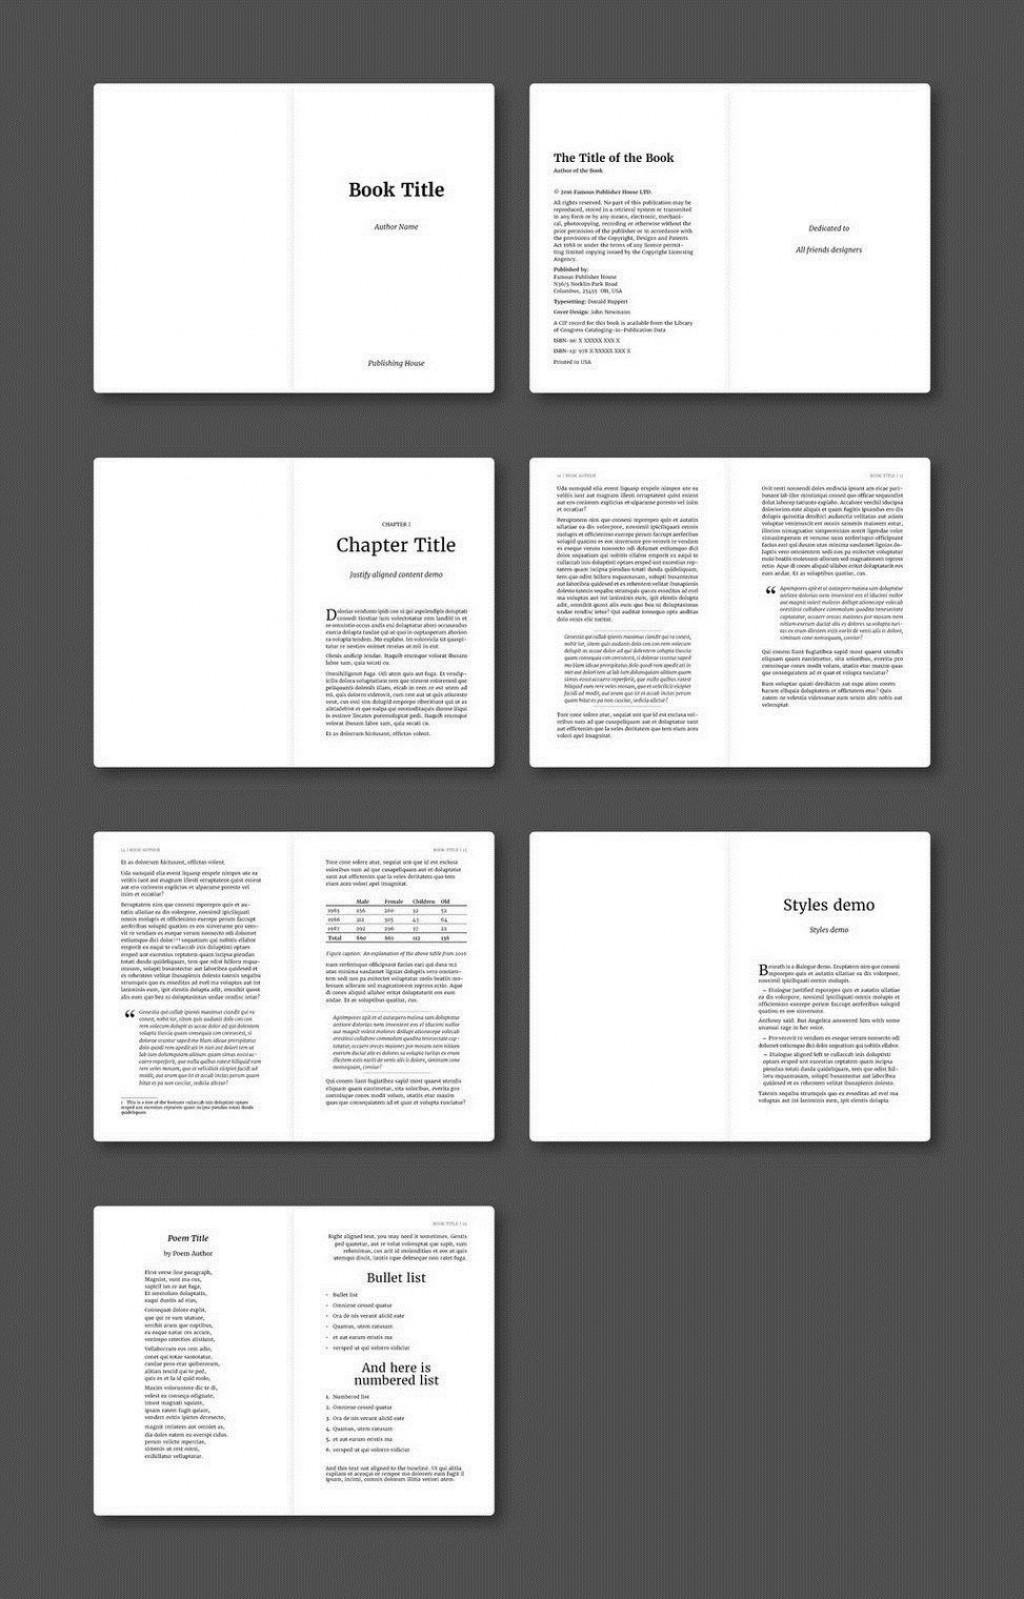 007 Shocking Indesign Book Layout Template High Resolution  Free DownloadLarge